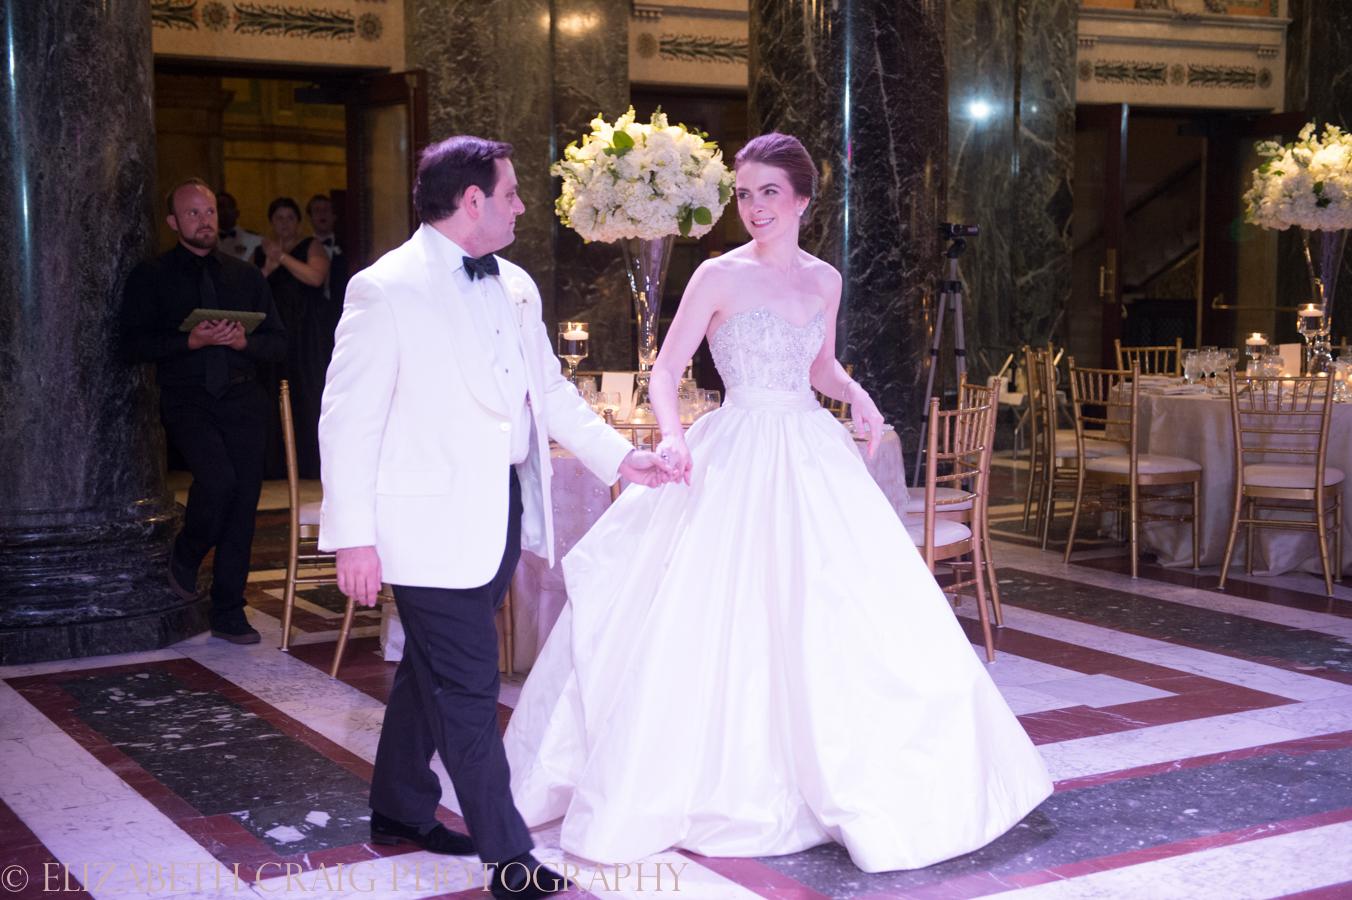 Carnegie Museum Music Hall Foyer Wedding Receptions-11